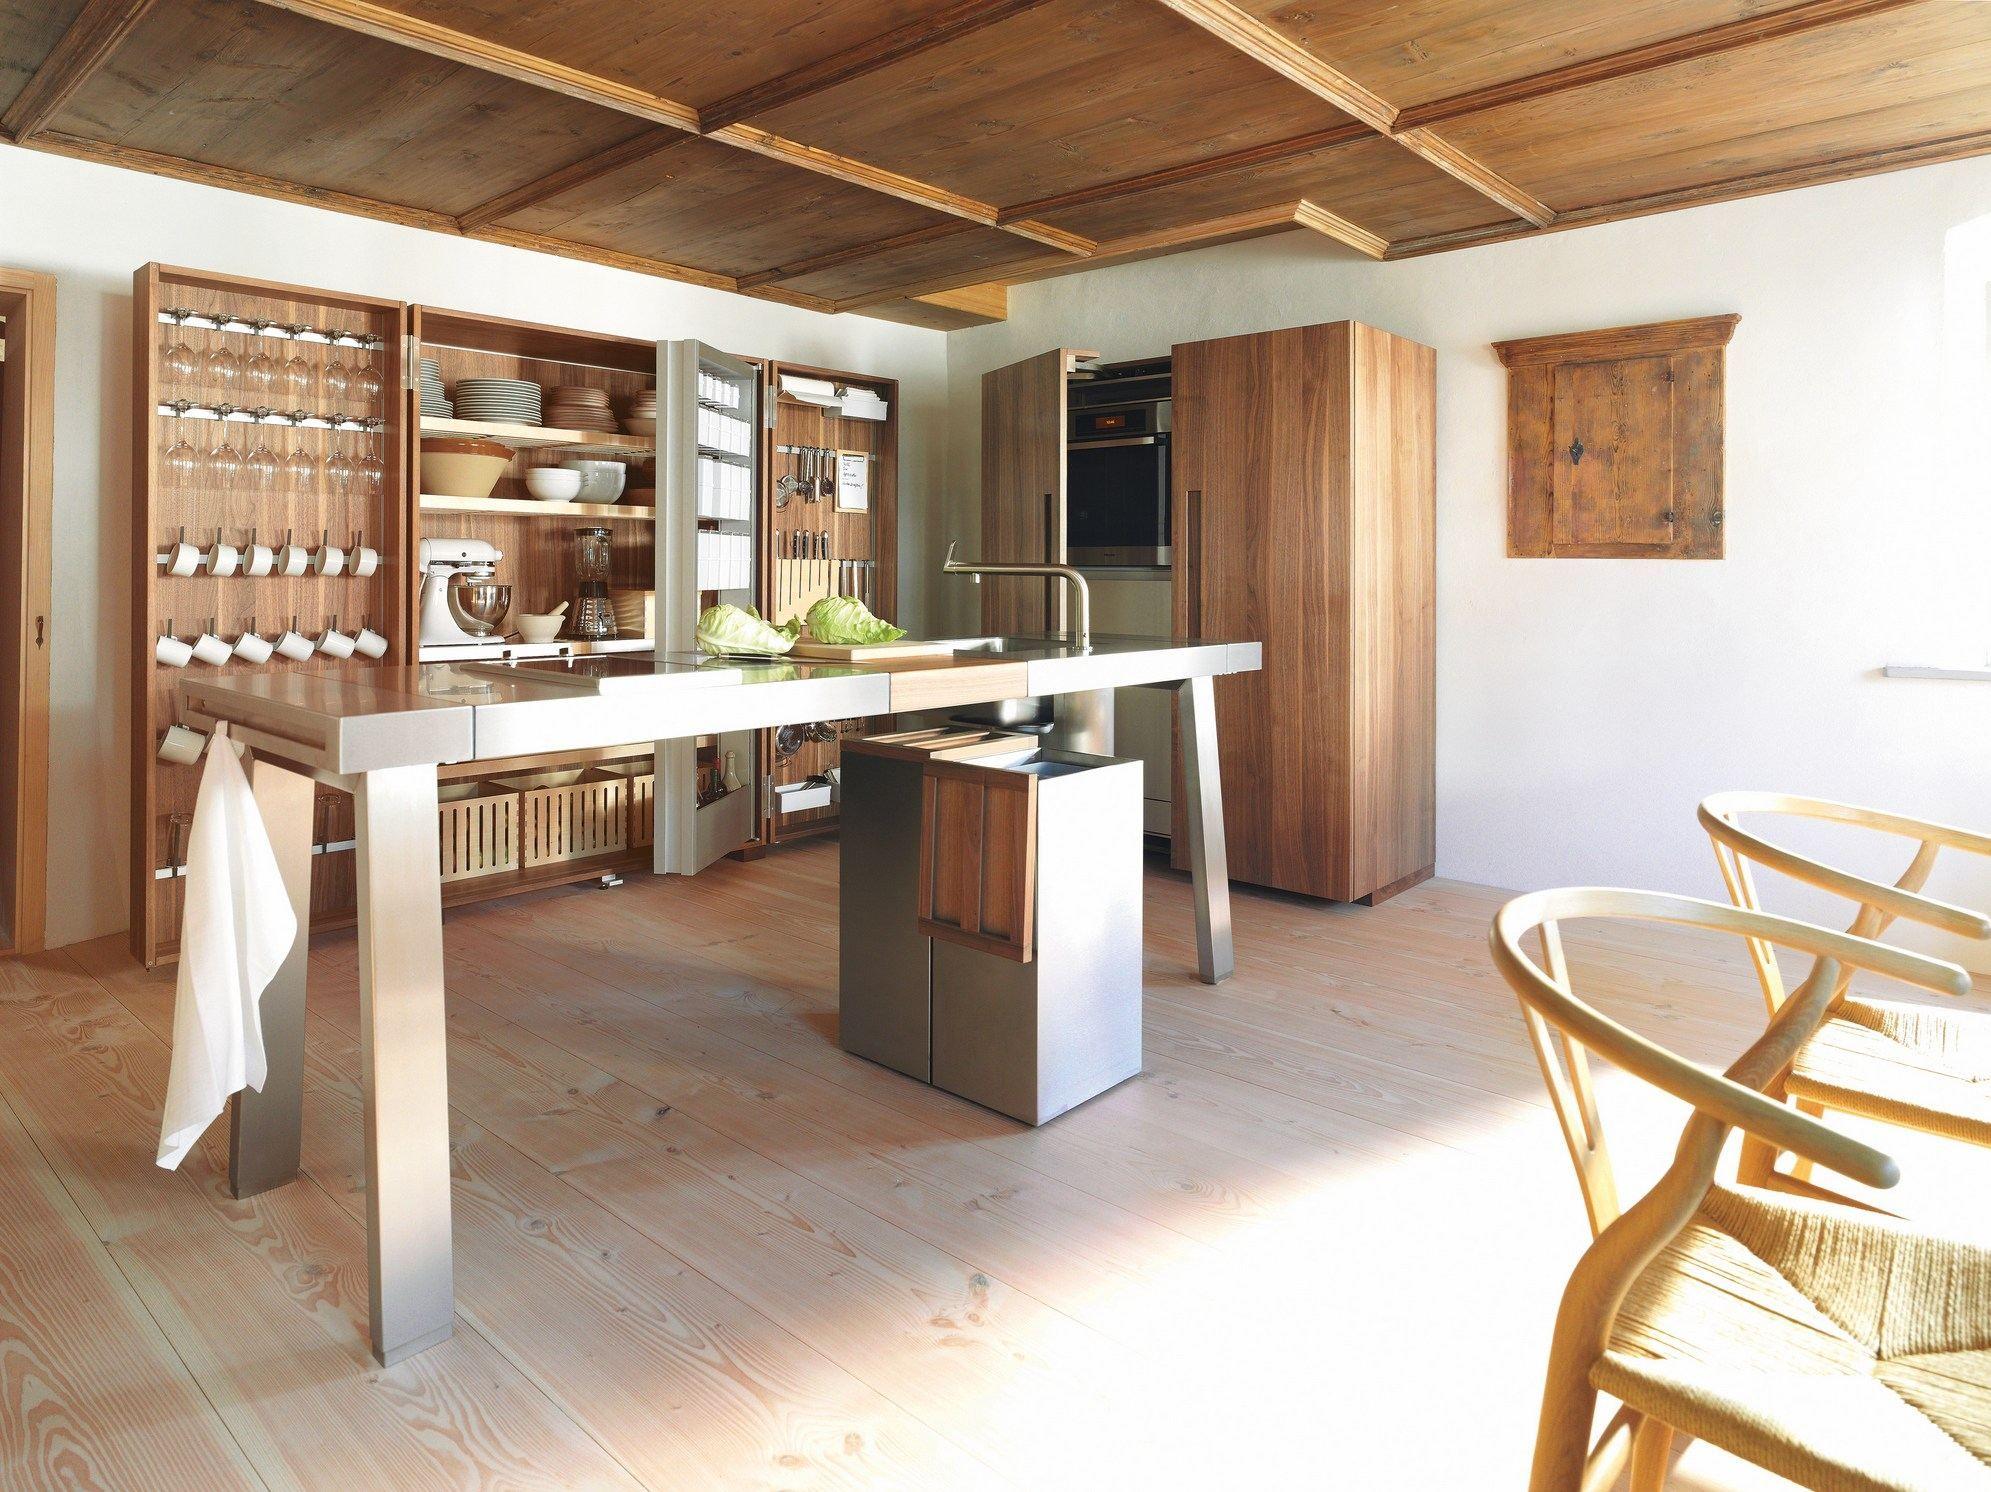 Einbauküche B2 By Bulthaup Design EOOS